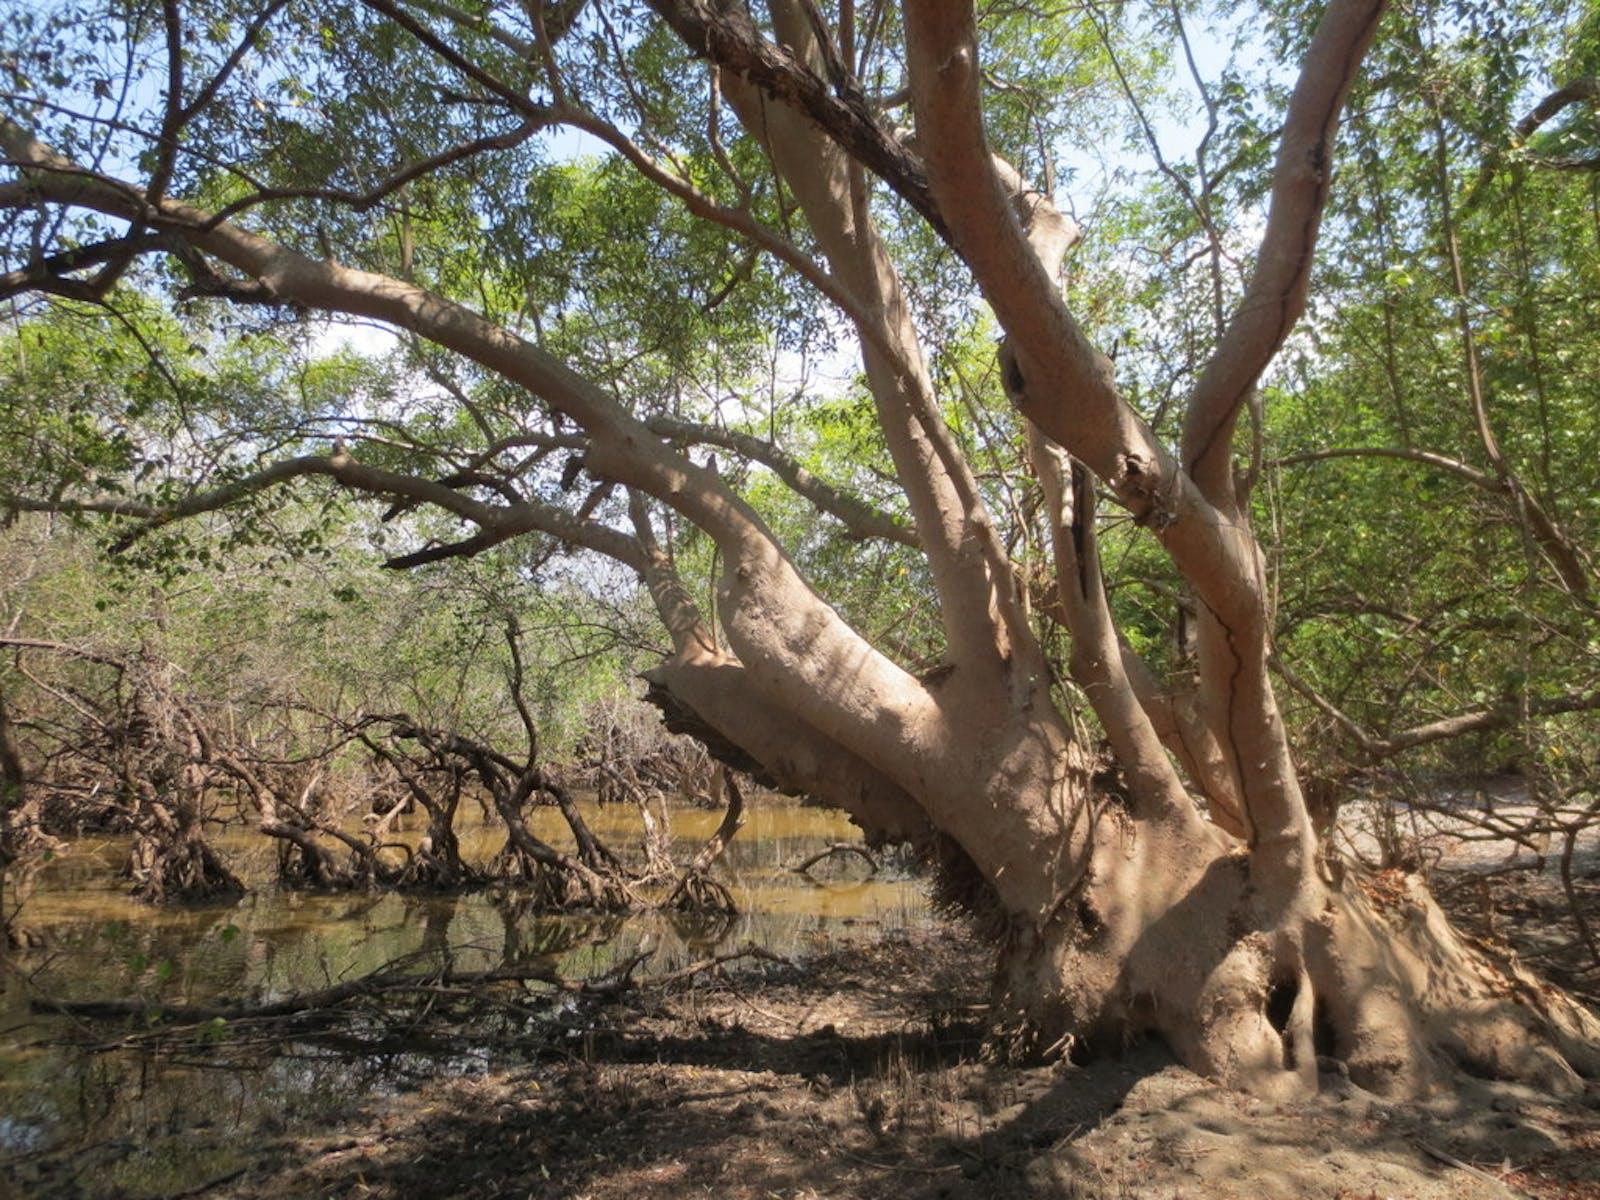 Indus River Delta-Arabian Sea Mangroves